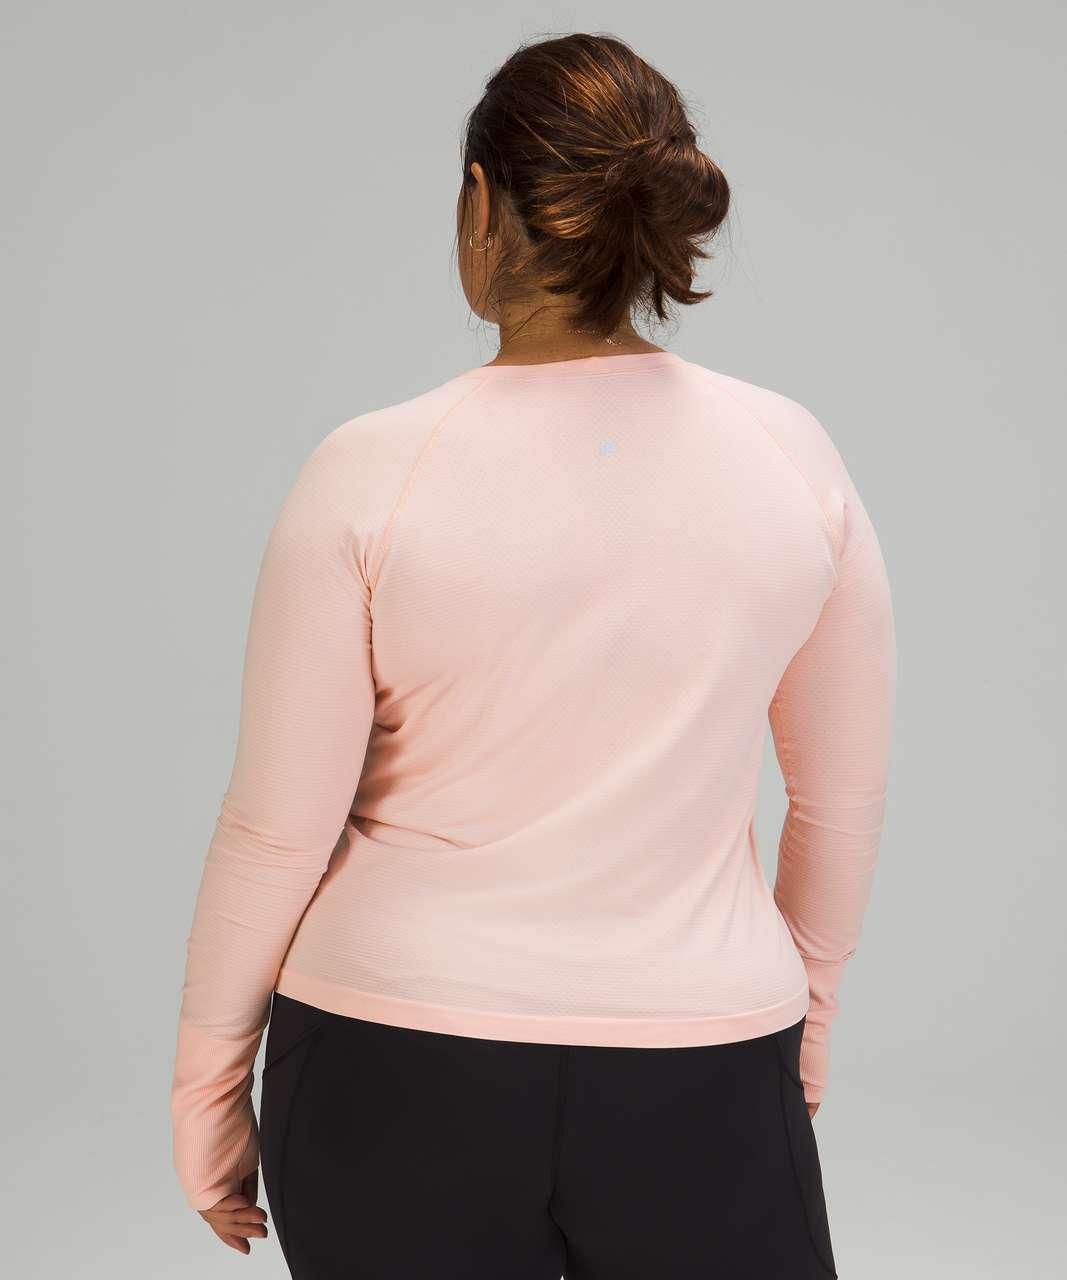 Lululemon Swiftly Tech Long Sleeve 2.0 *Race Length - Pink Mist / Pink Mist